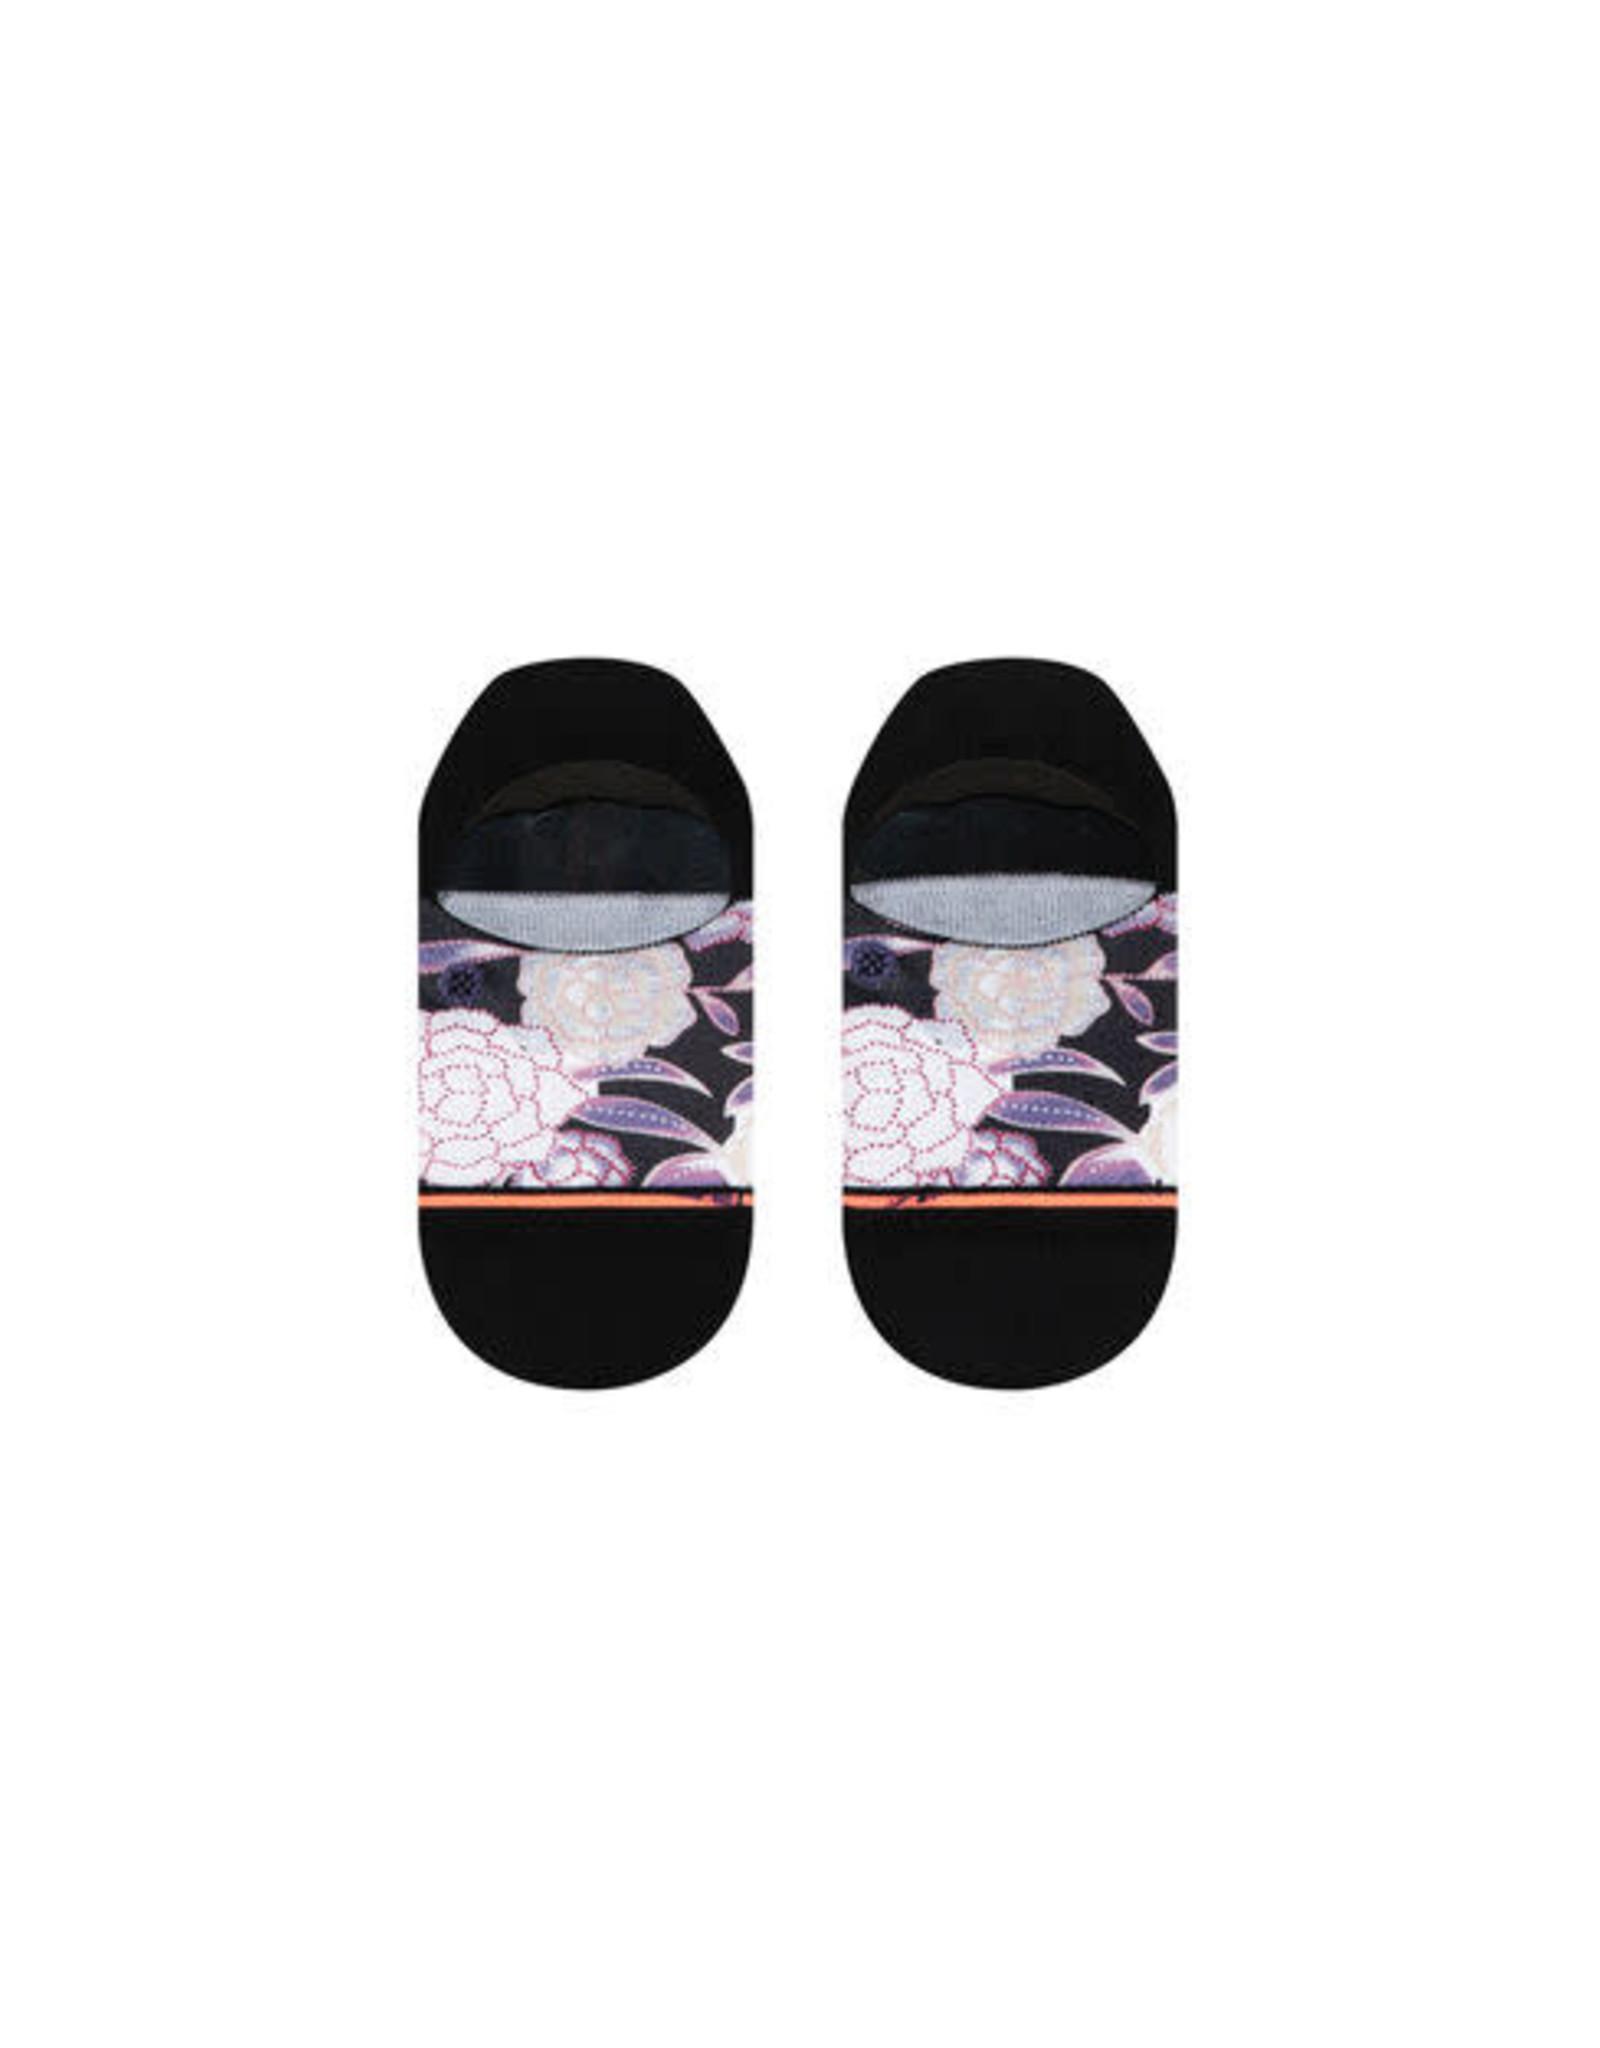 STANCE - Posey Socks